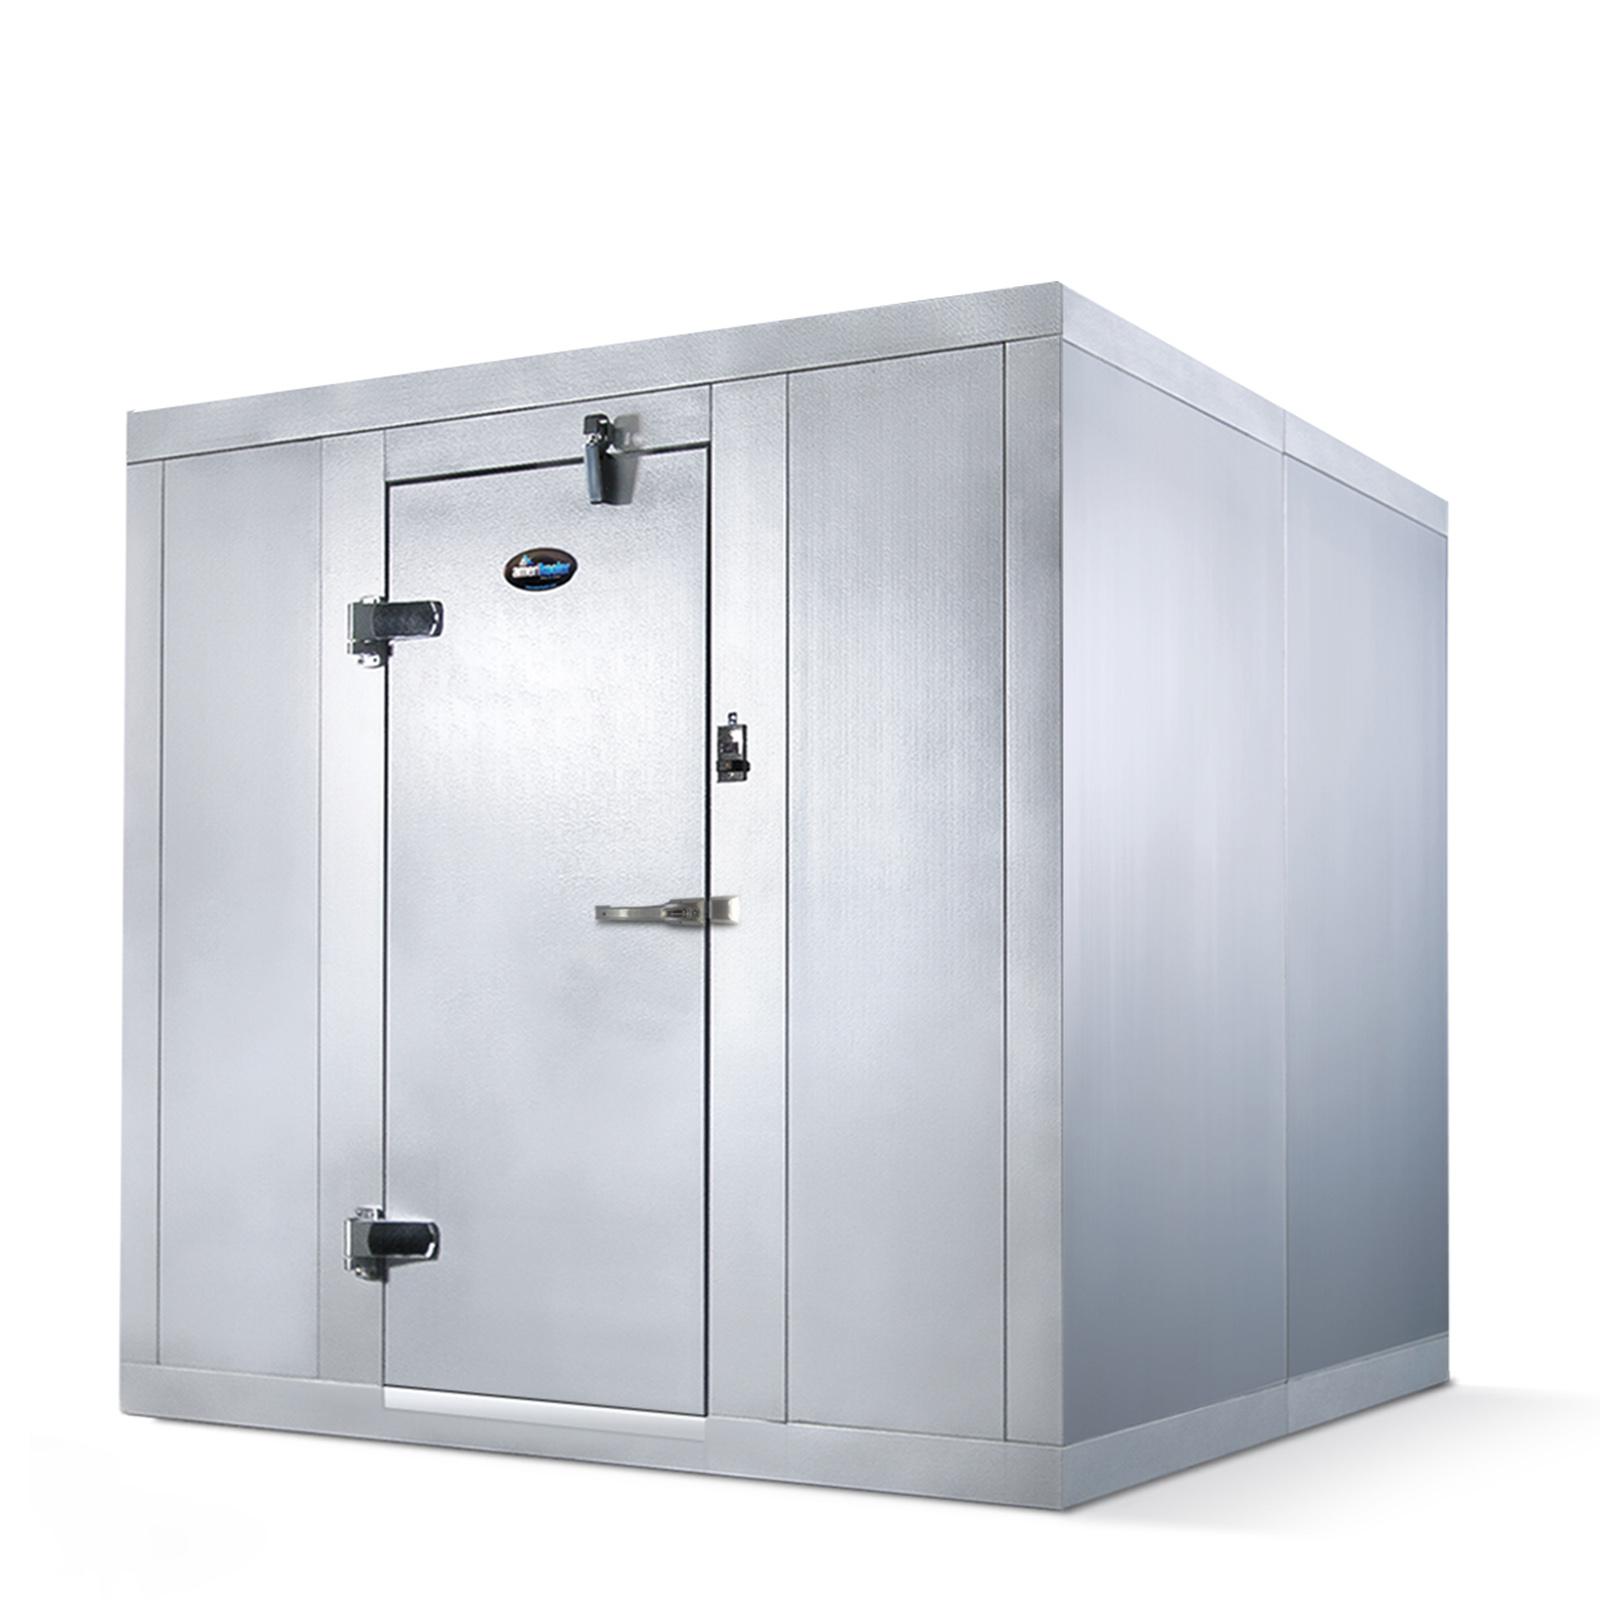 AmeriKooler DC061072**NBRC walk in cooler, modular, remote